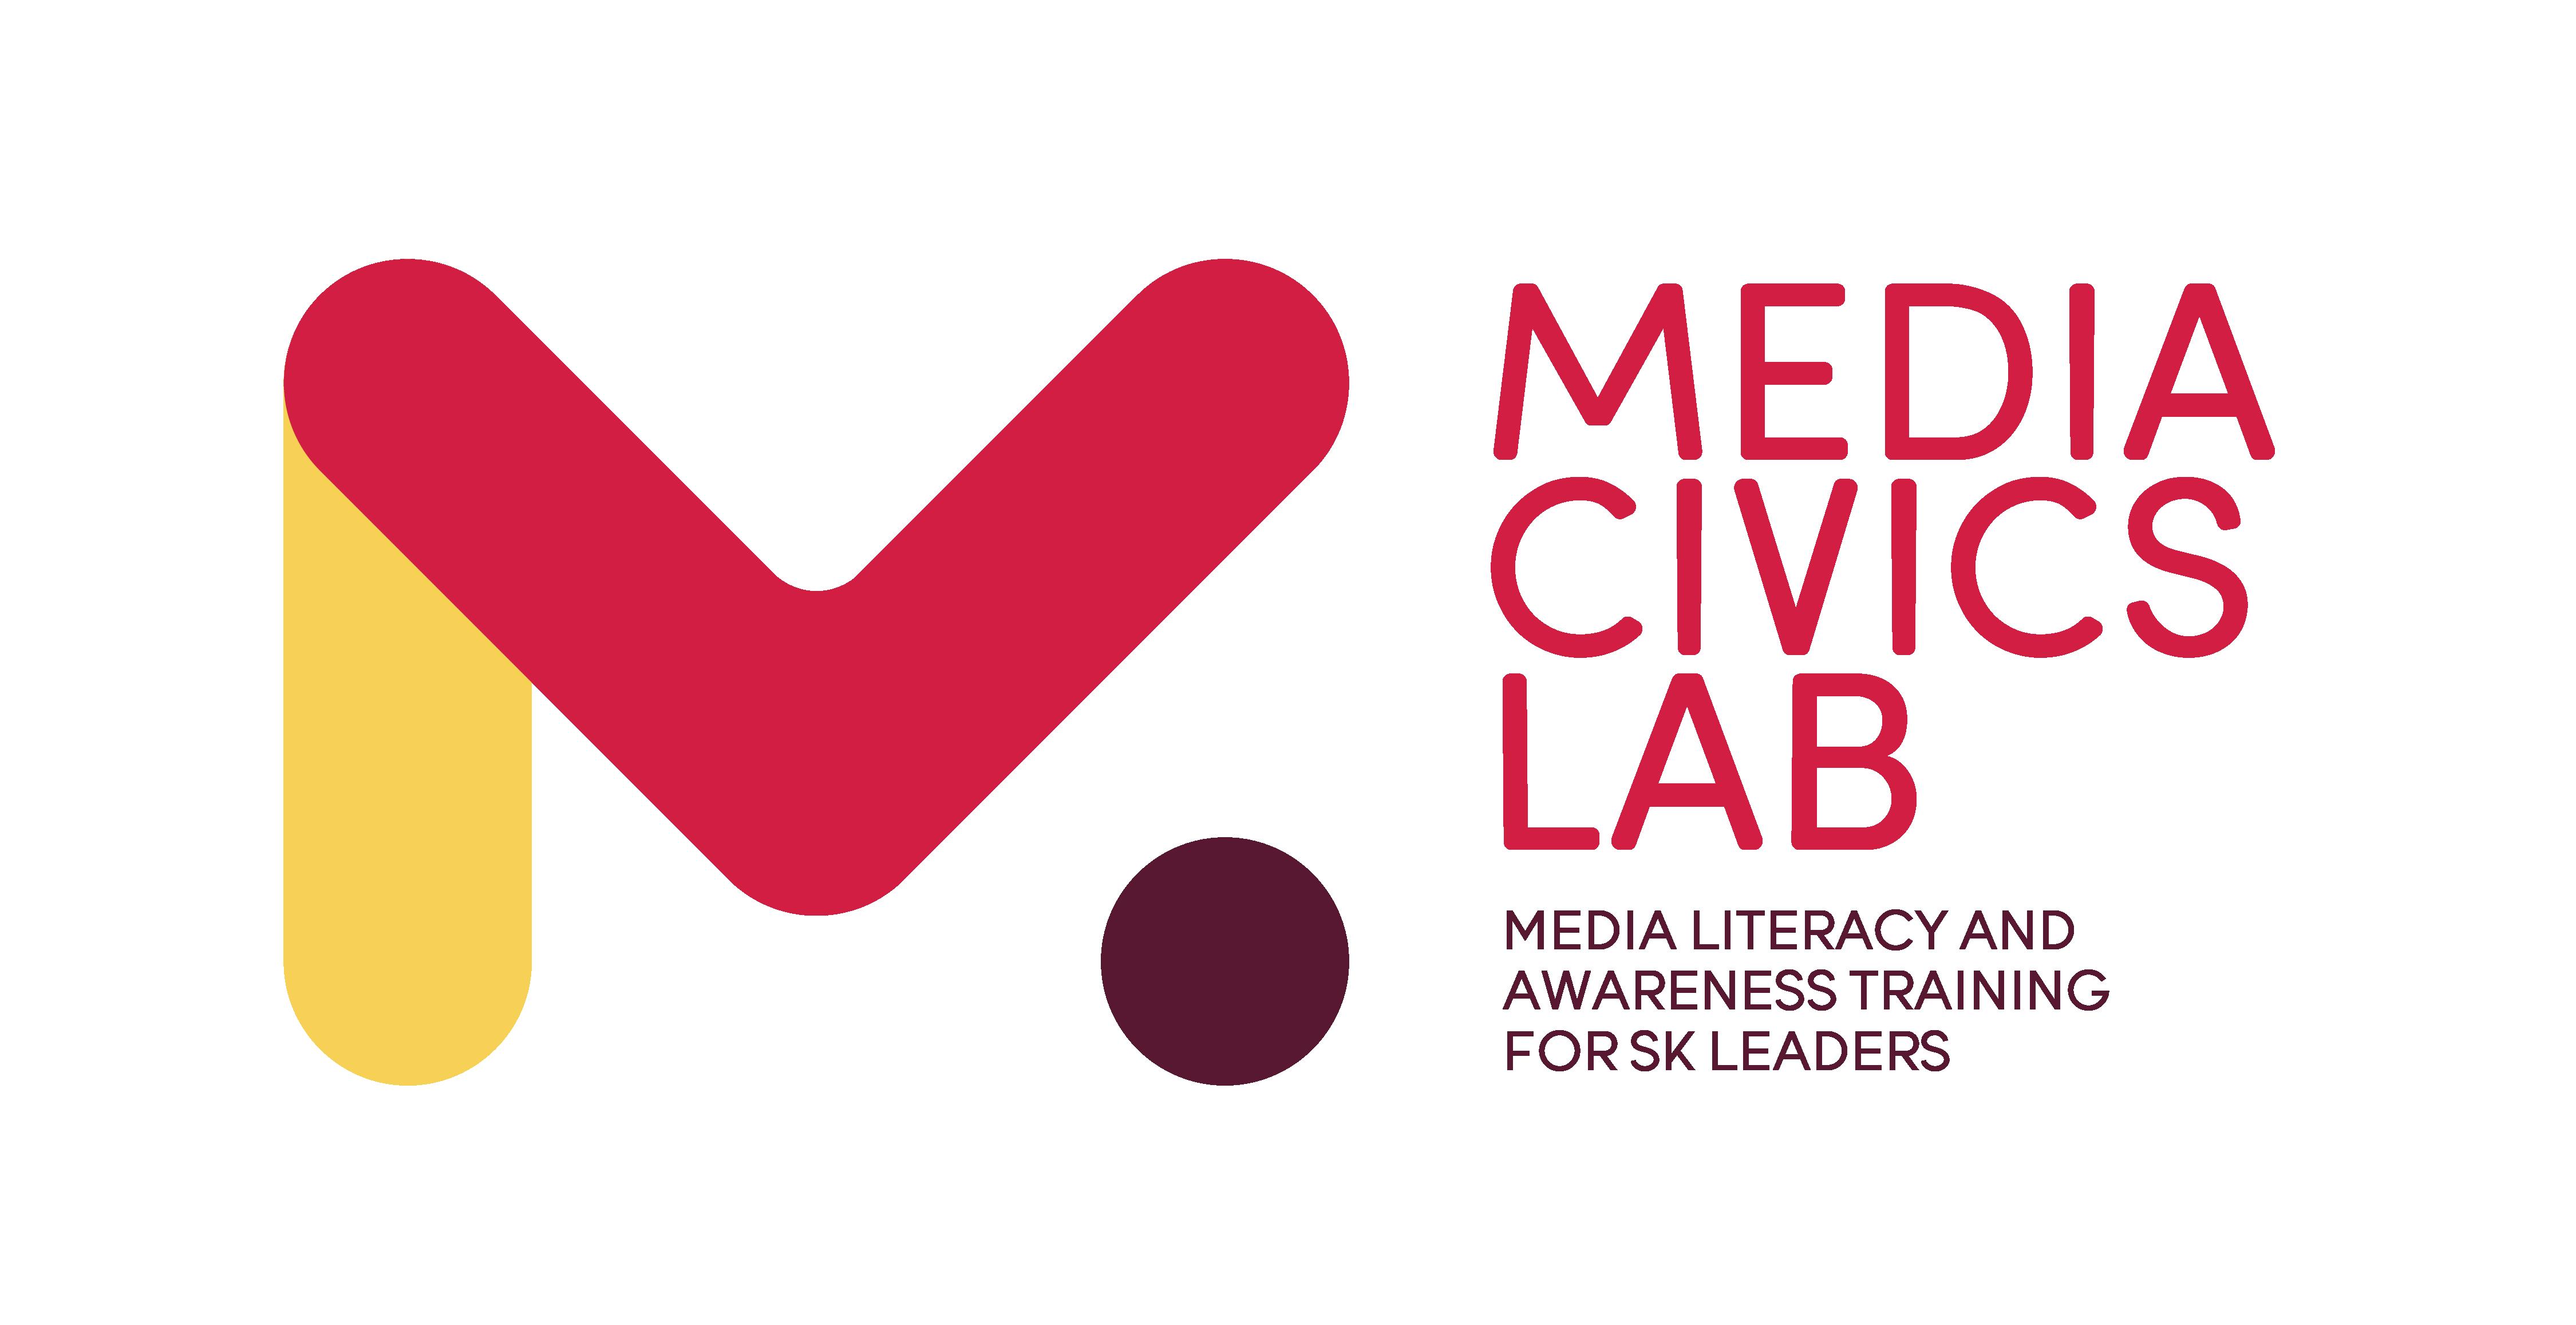 Media Civics Lab